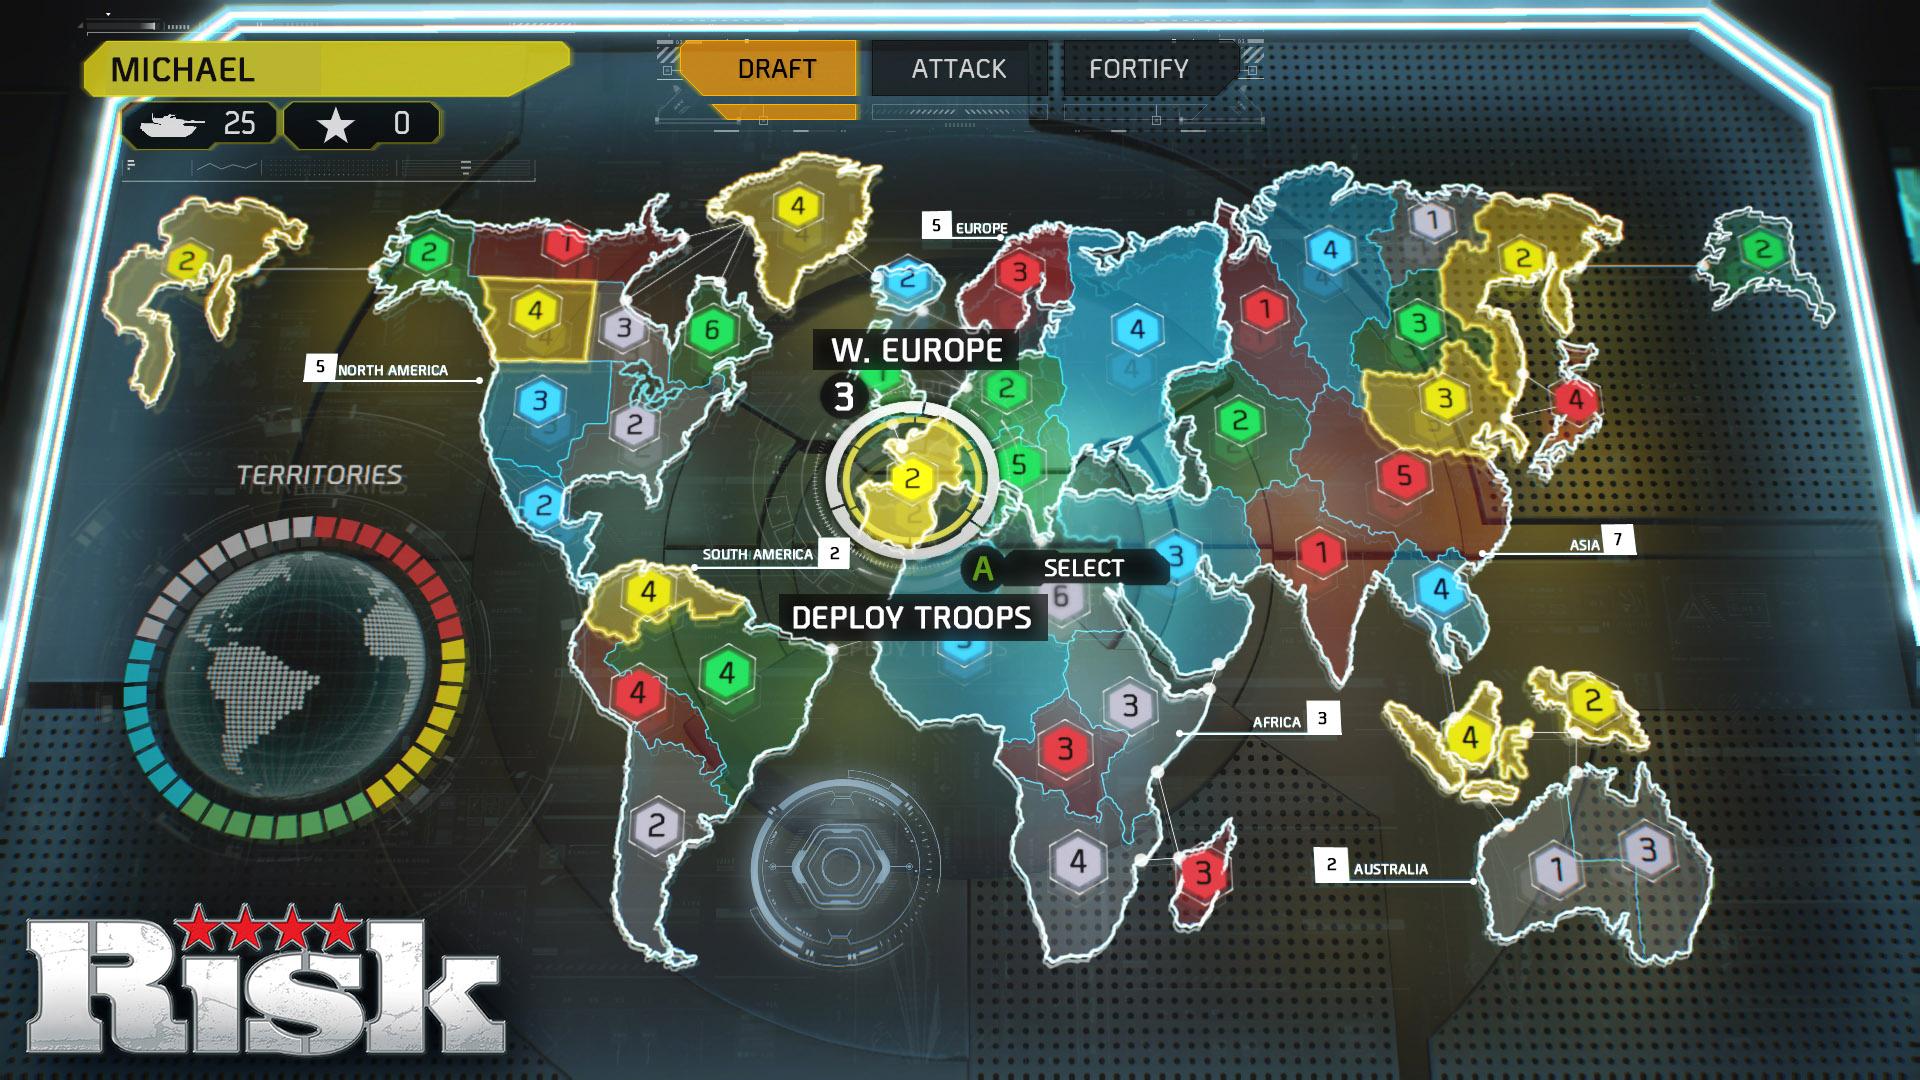 HGC Risk Screens 5